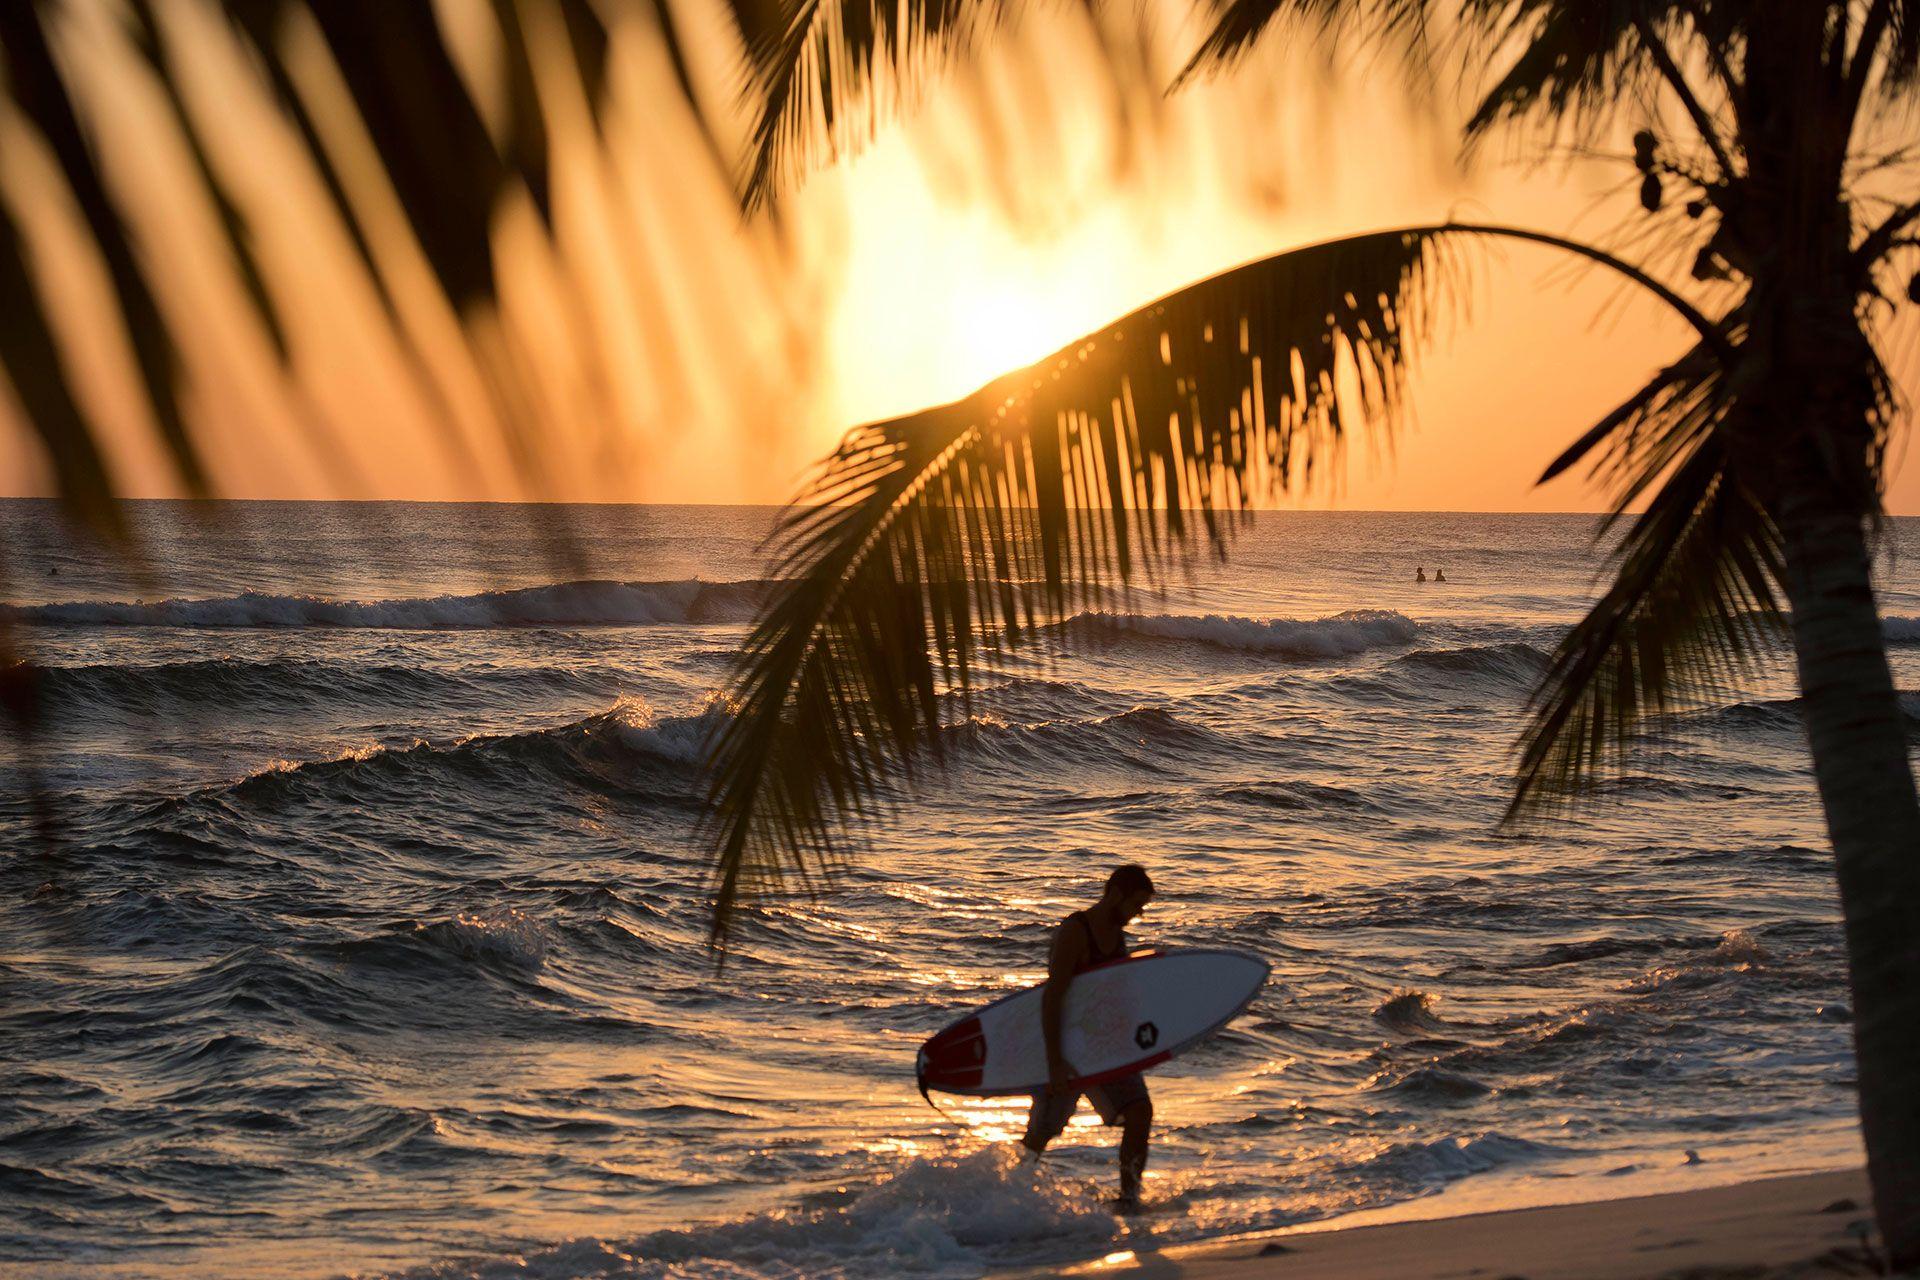 Chasing Light- Sunrise and Sunset Photography